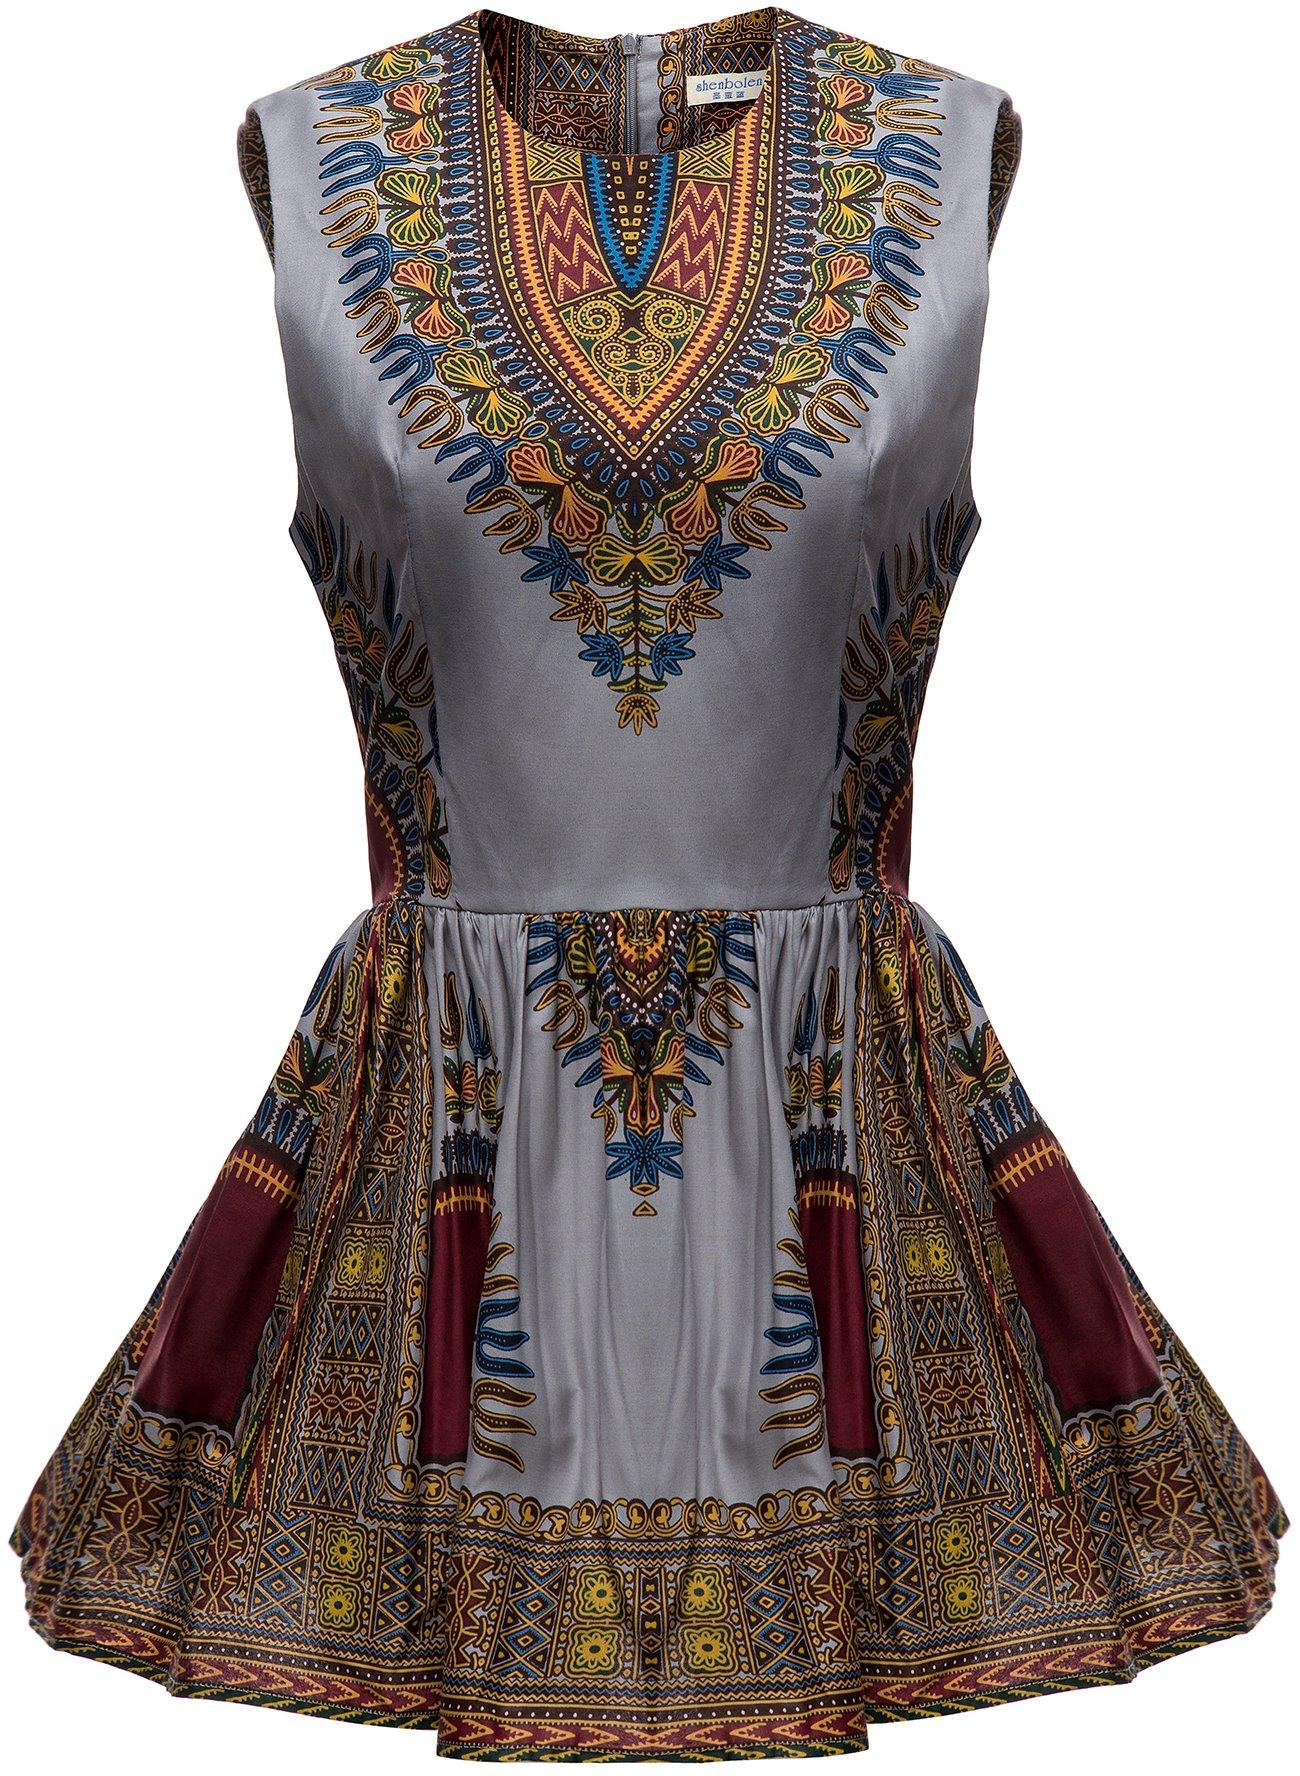 Shenbolen Women African Print Shirt Dashiki Traditional Top(A,Medium)